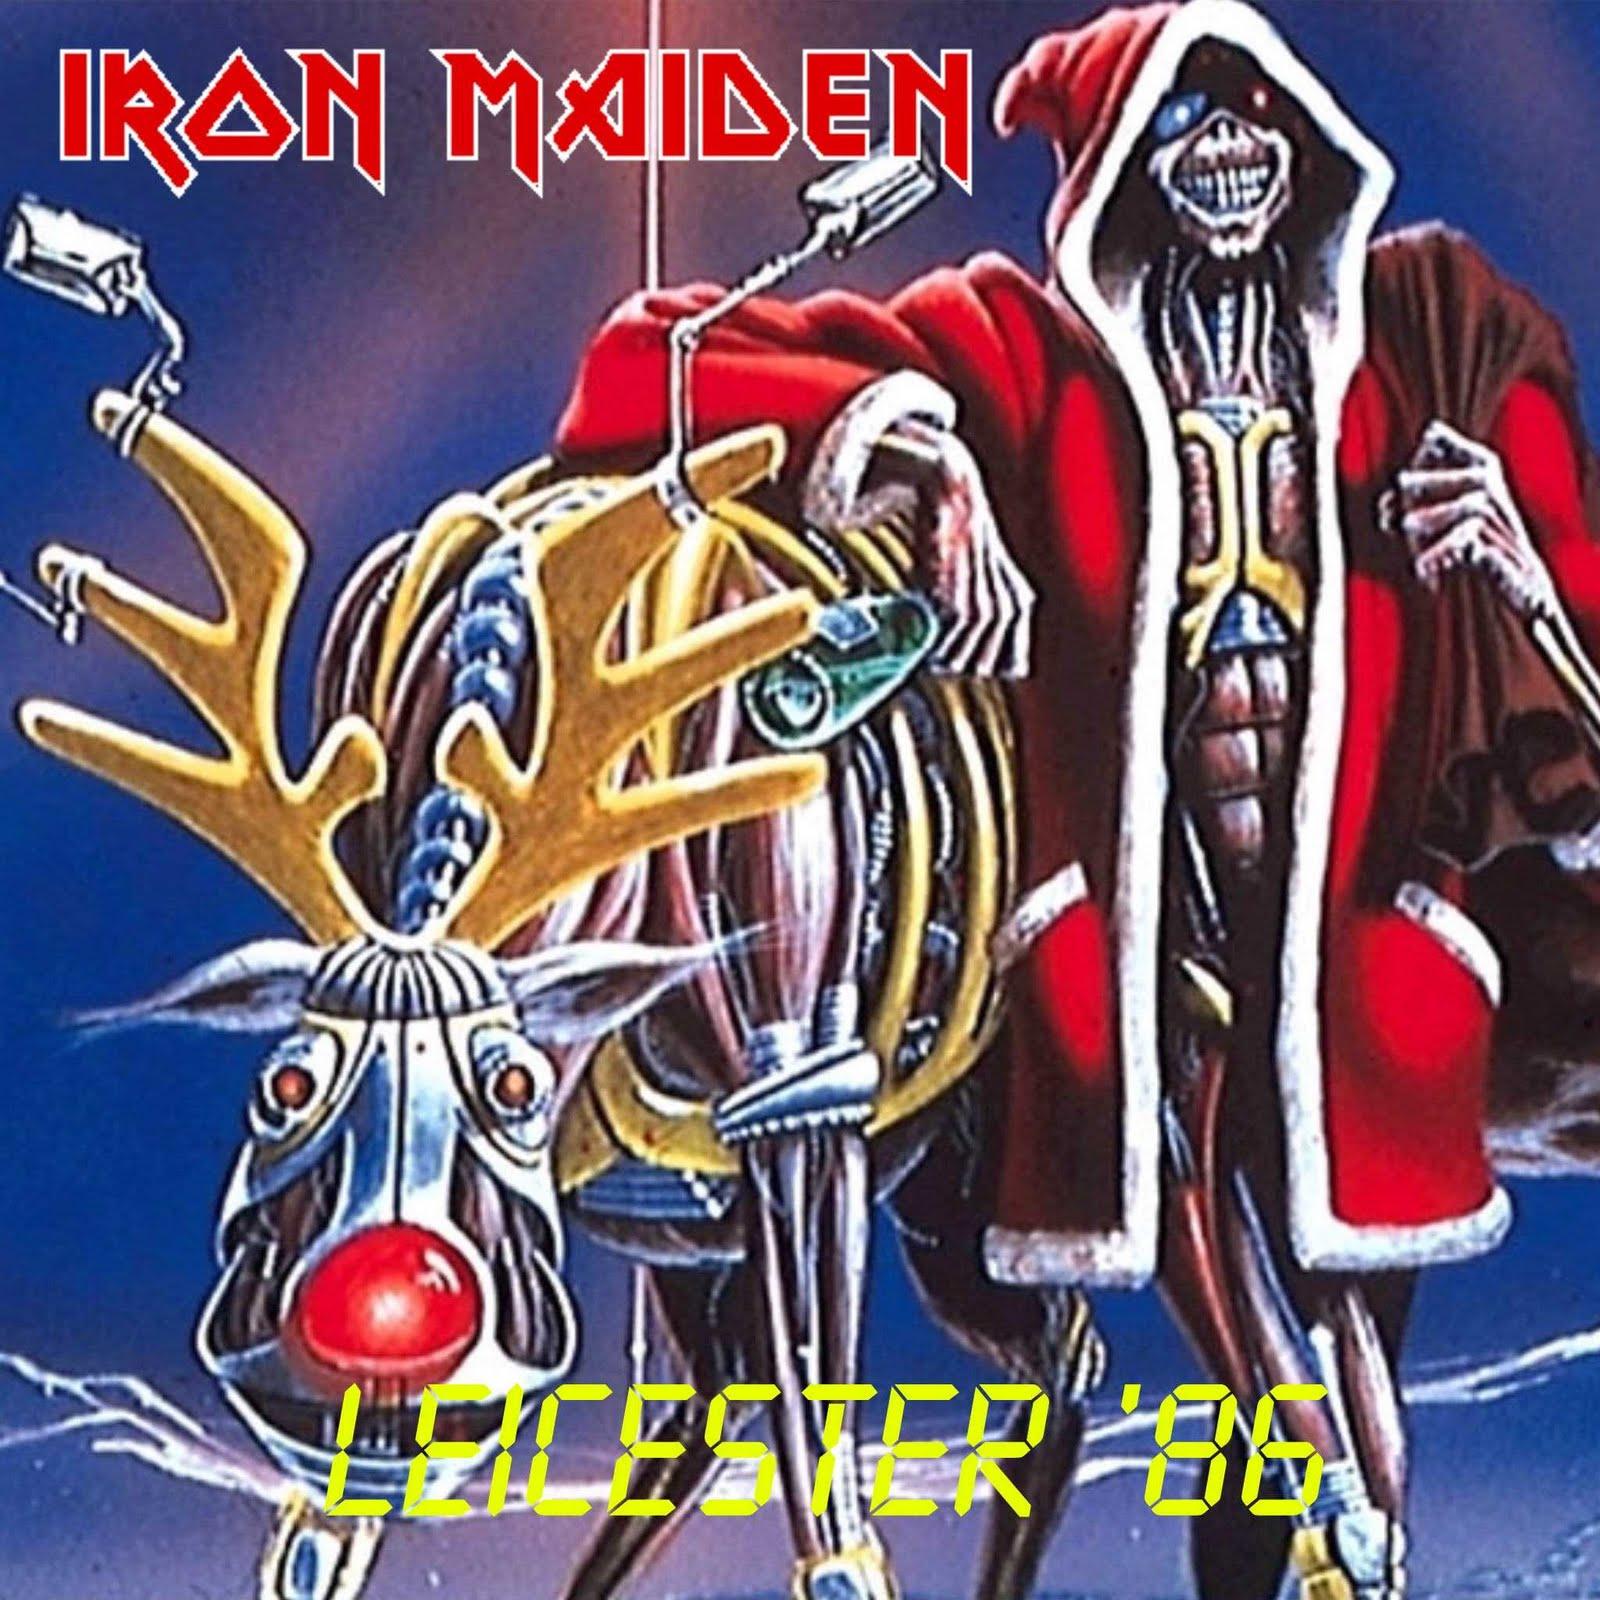 New: Iron Maiden - Leicester '86 (Bootleg)